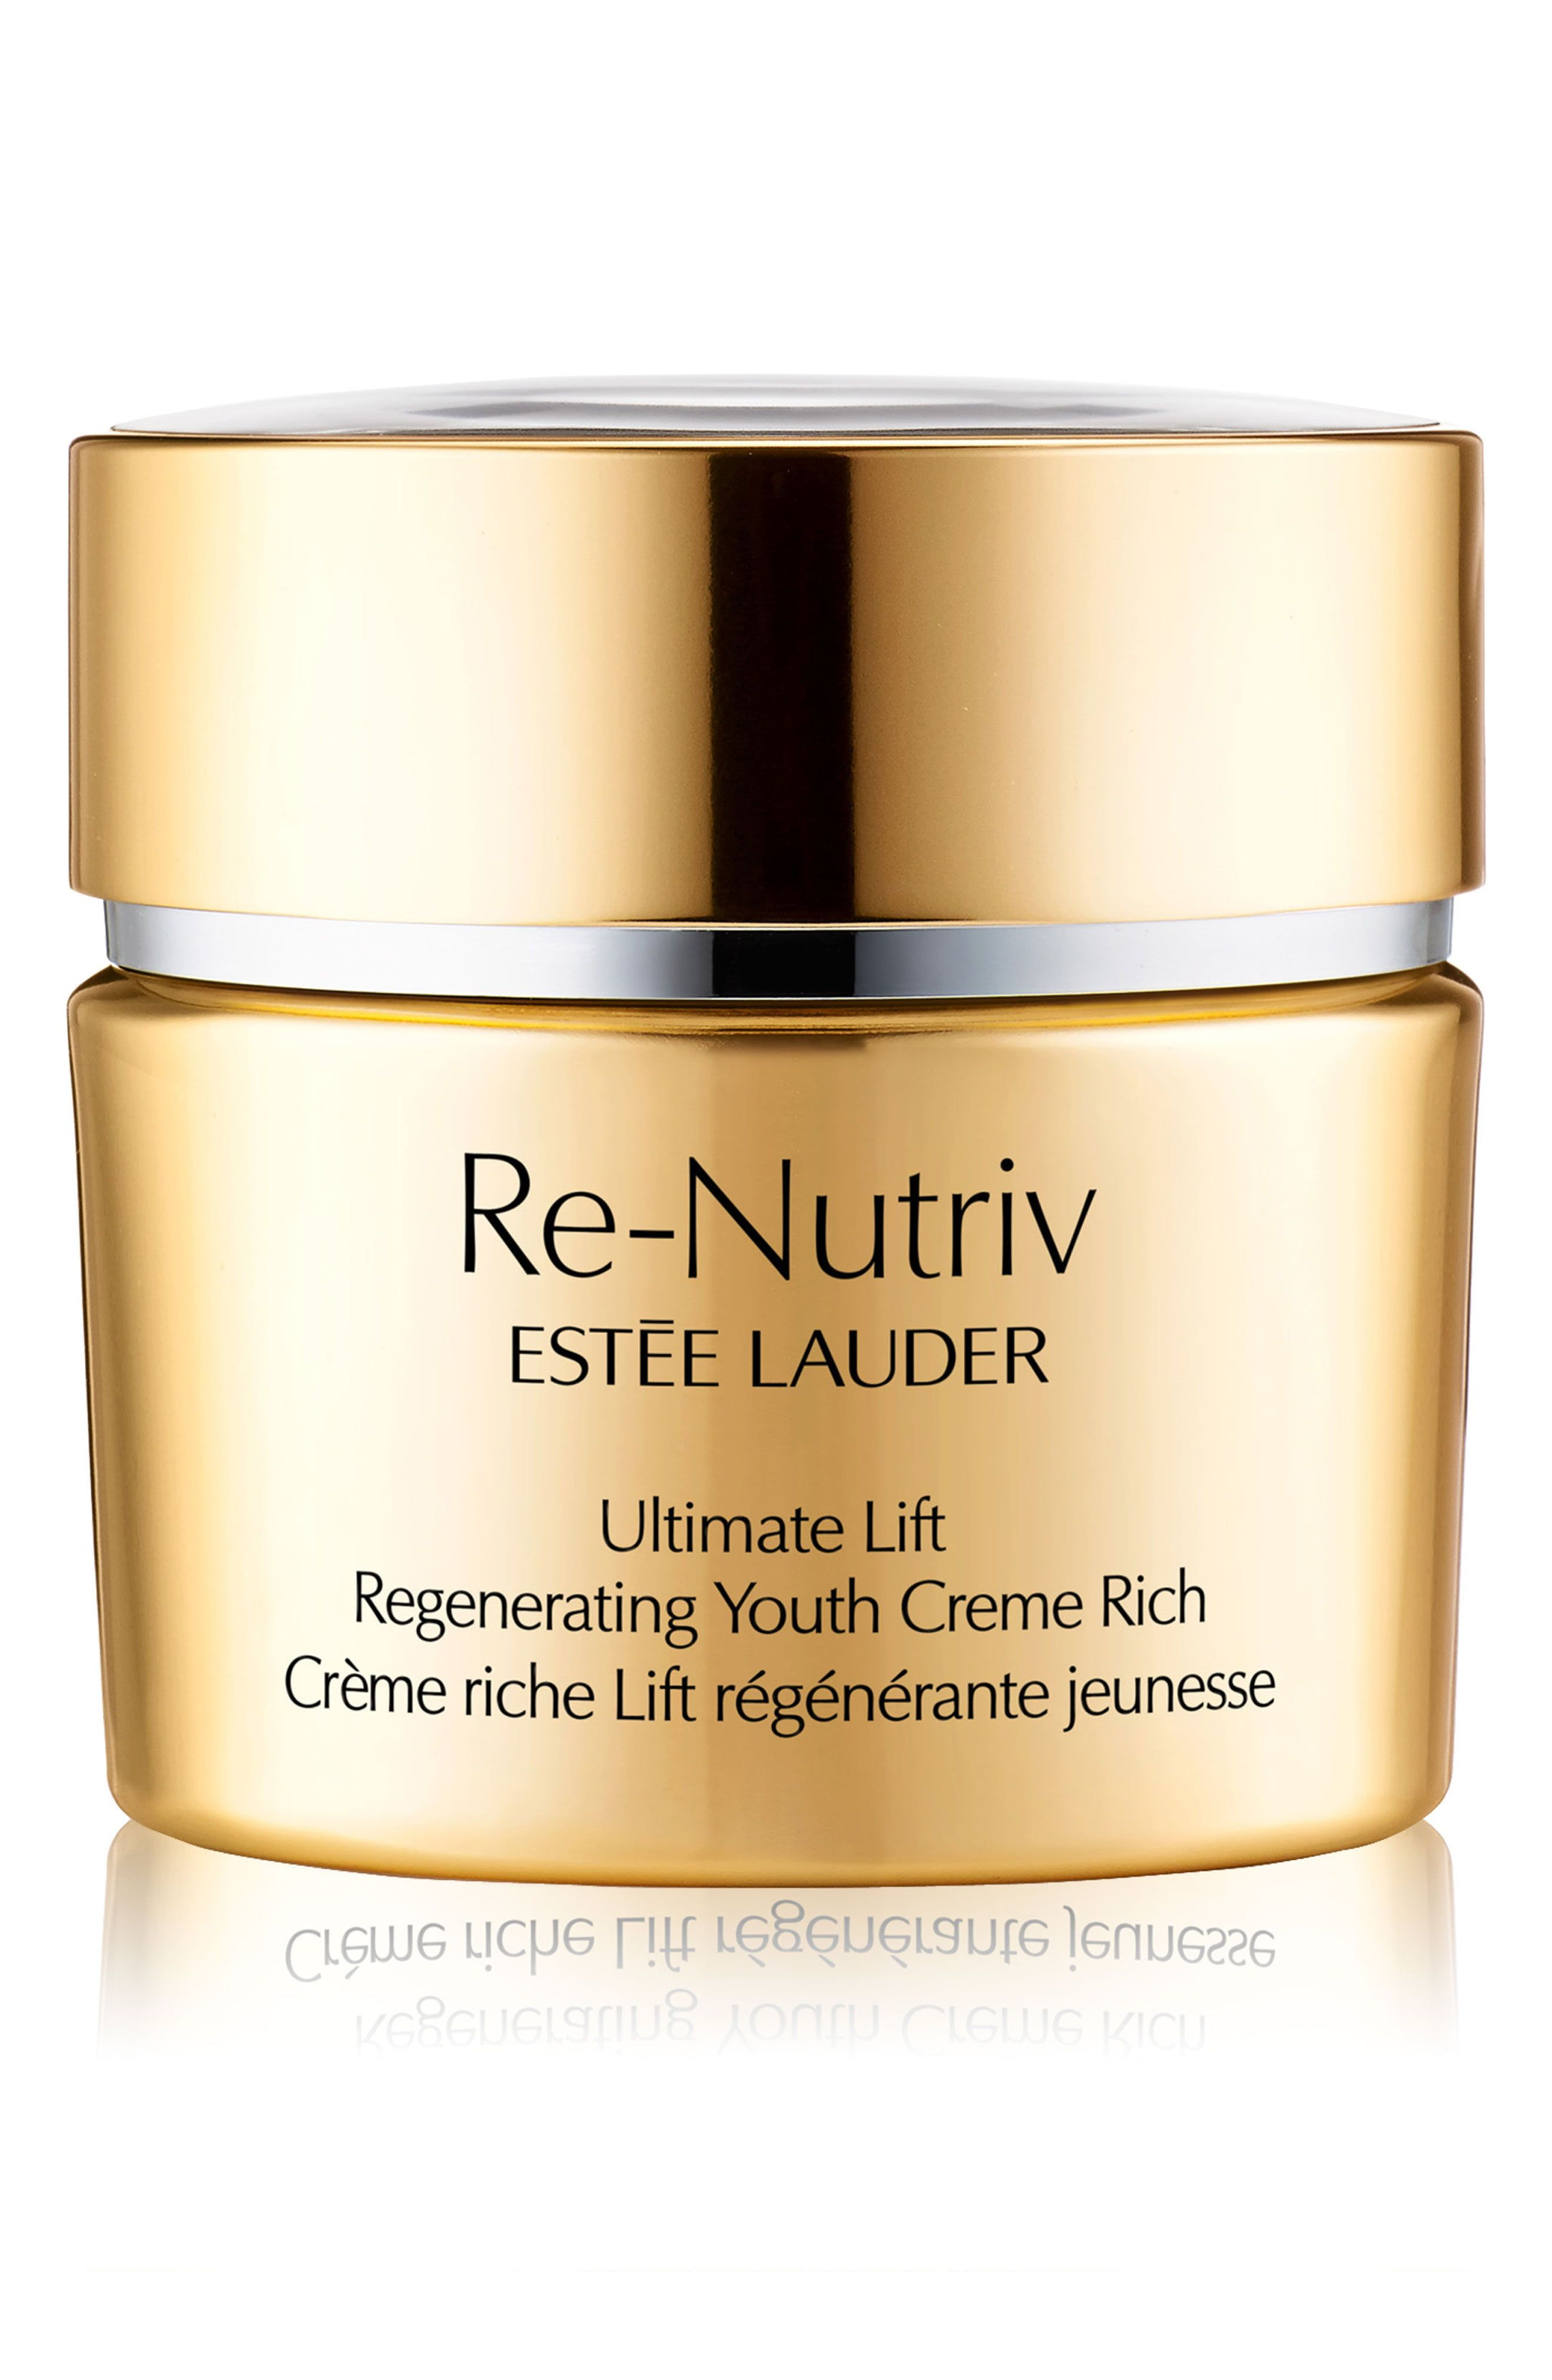 Estee Lauder Re Nutriv Ultimate Lift Regenerating Youth Creme Rich Estee Lauder Bath Body Body Treatments